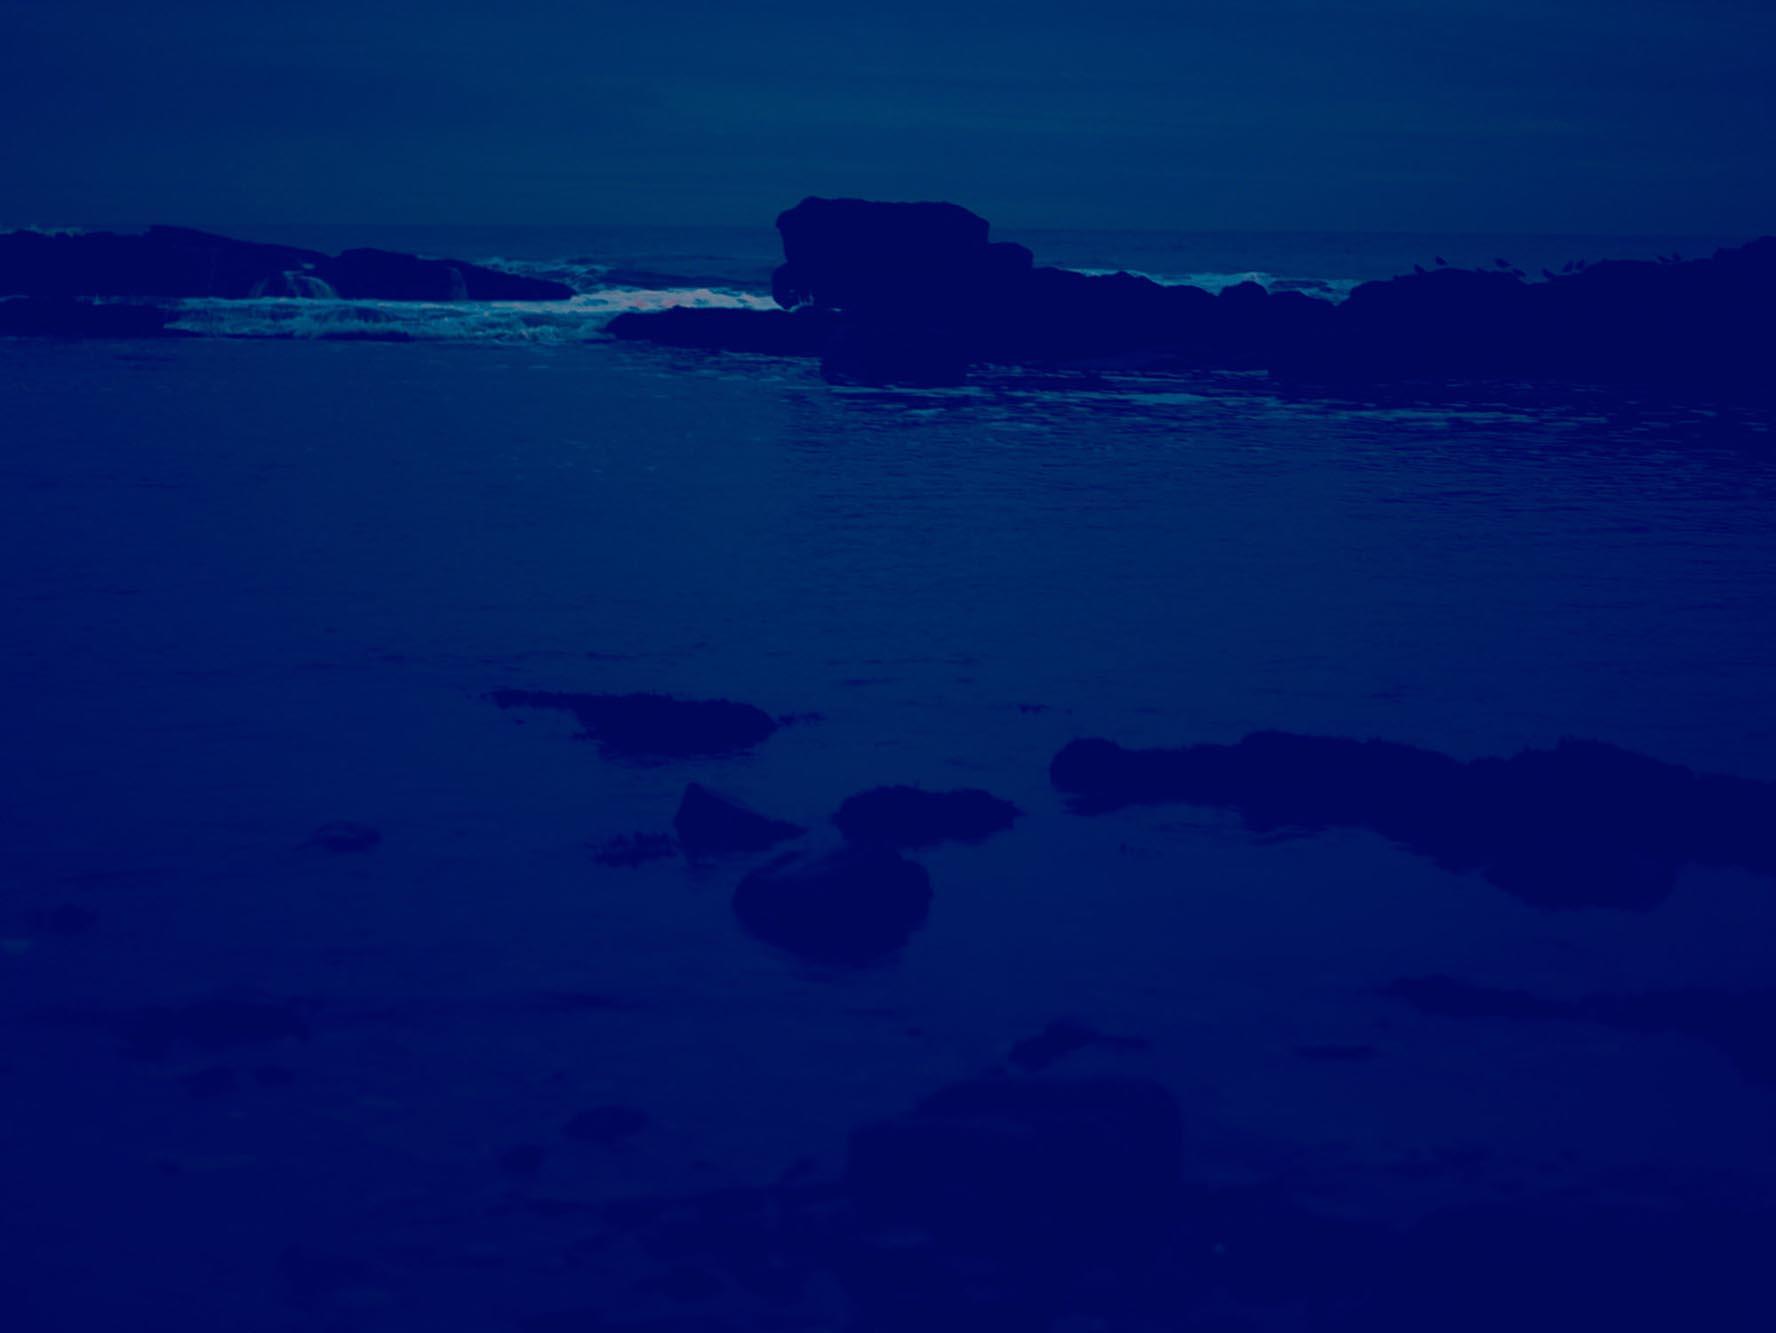 Noel McLaughlin Seascape